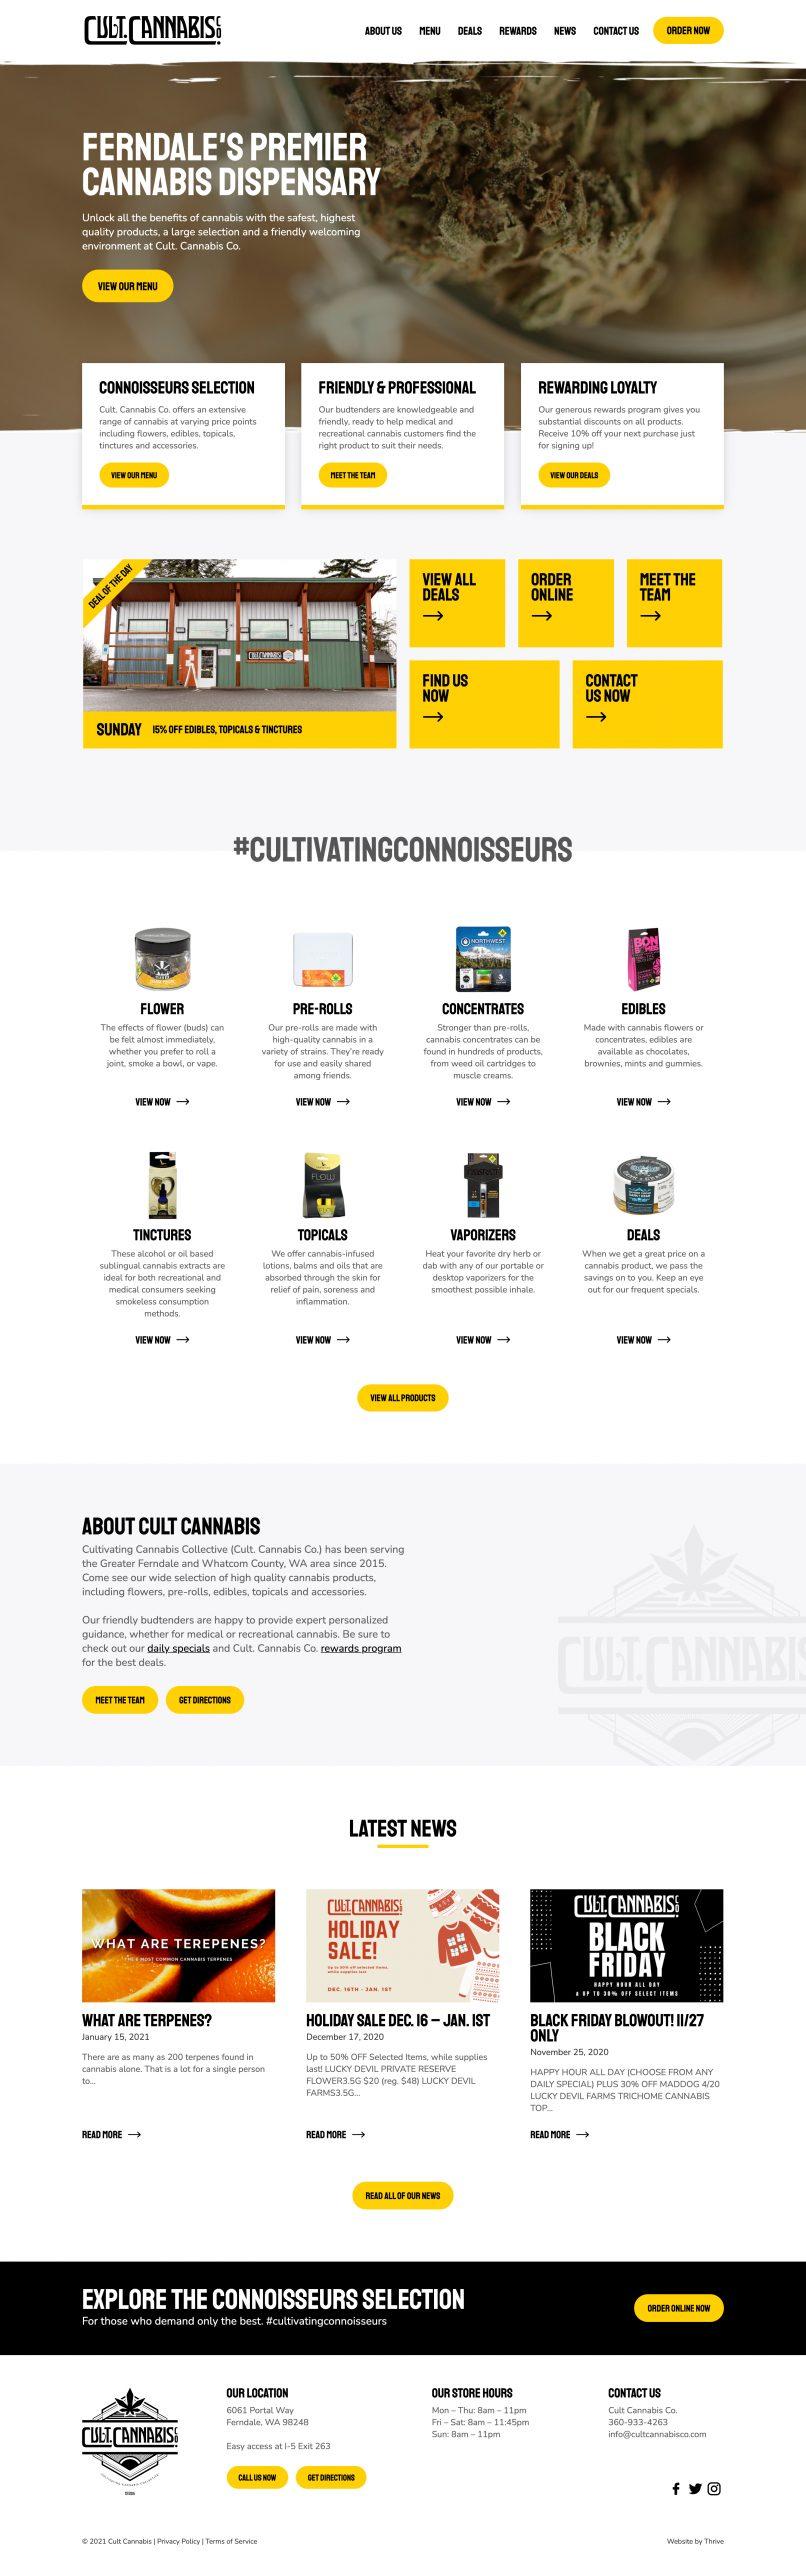 Cult. Cannabis web page